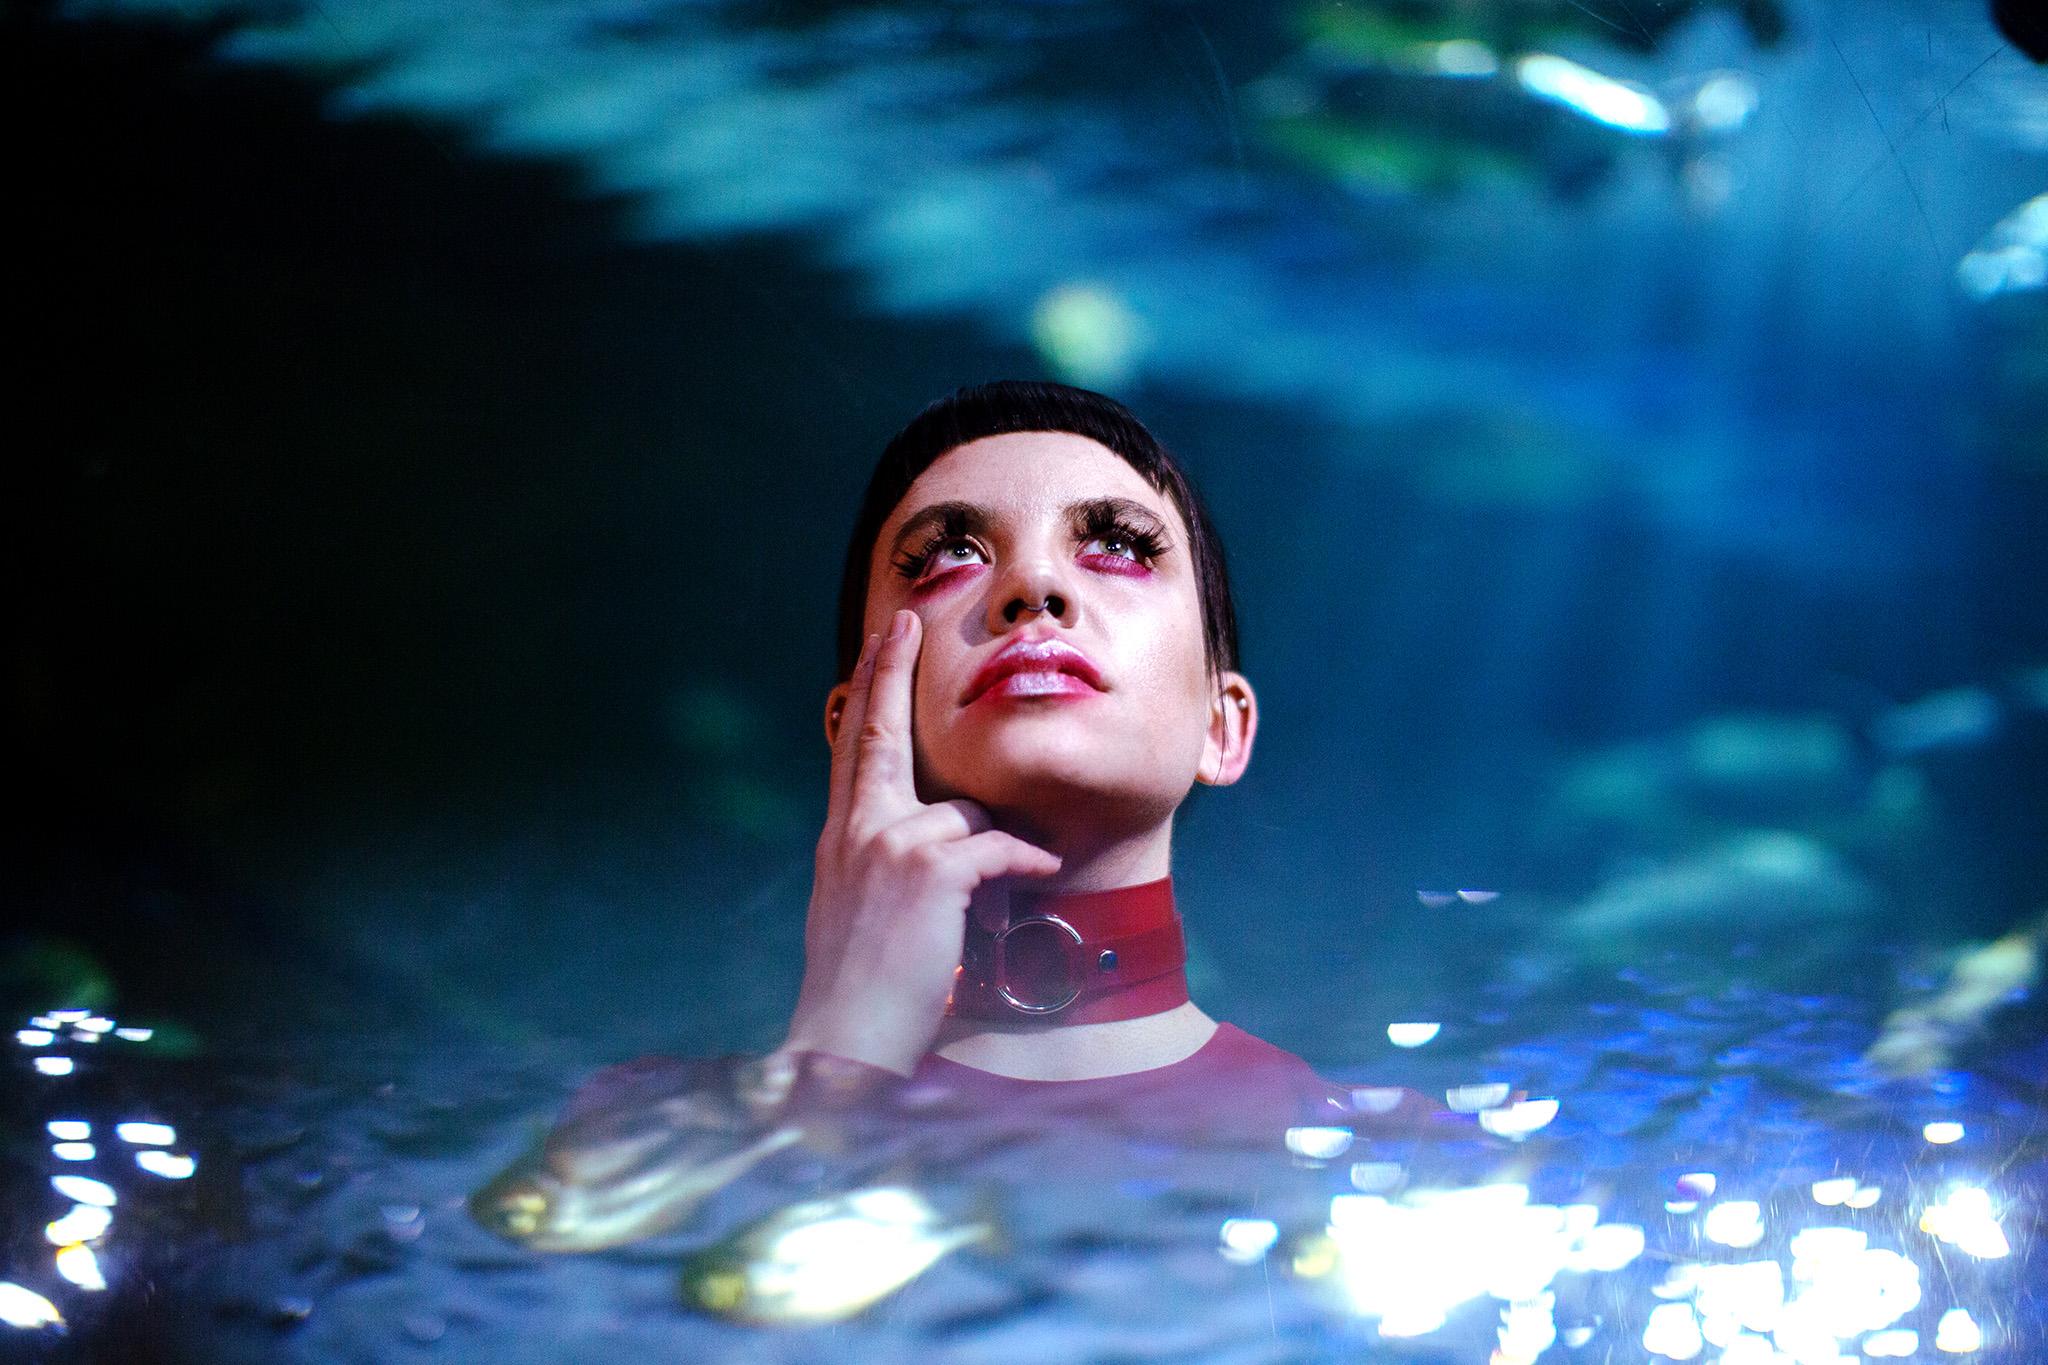 4_Hearts Full of Glass_Lauren Wuornos.jpg